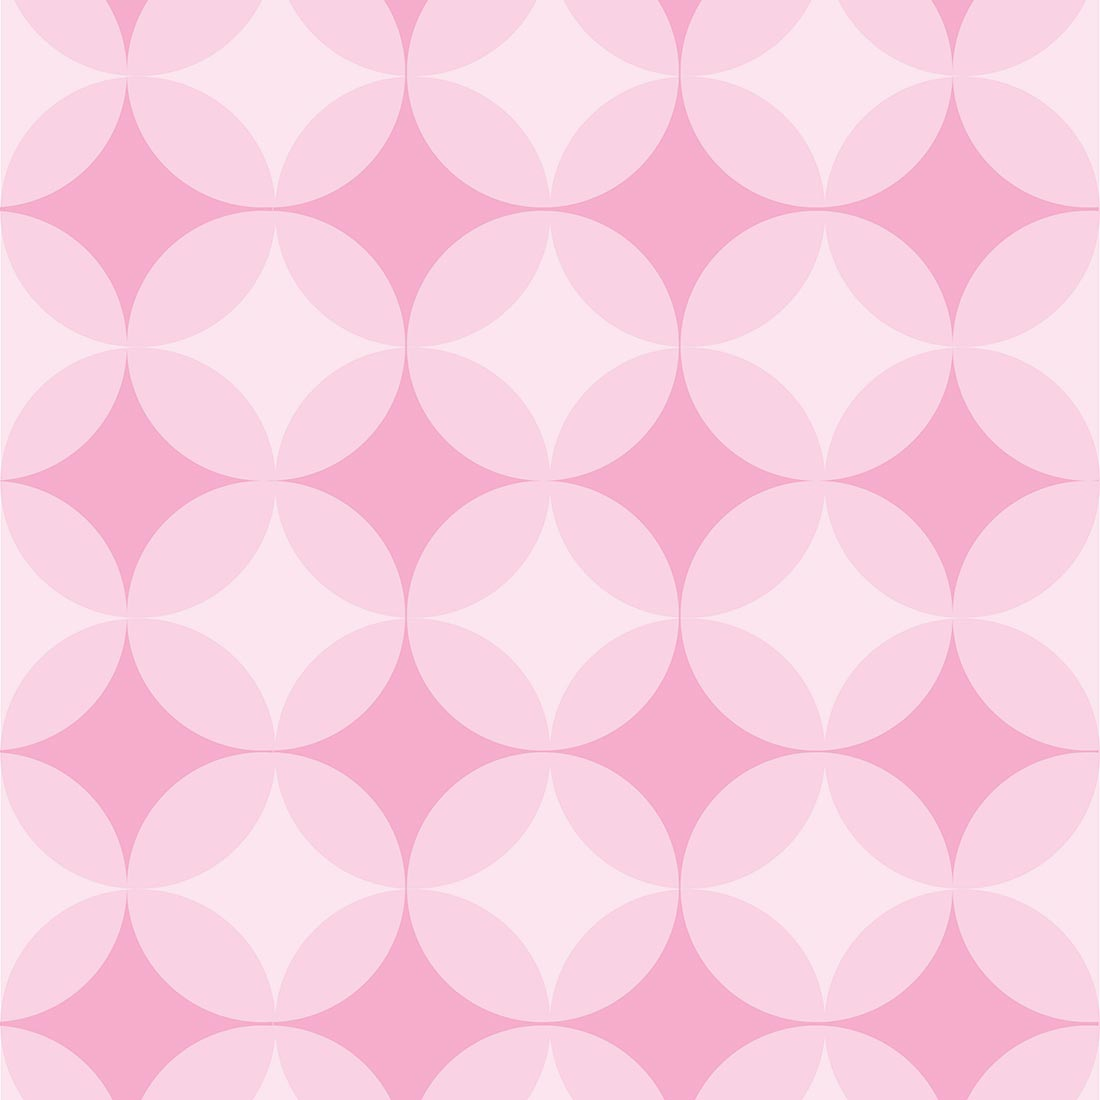 Papel de Parede Abstrato Círculo Rosa